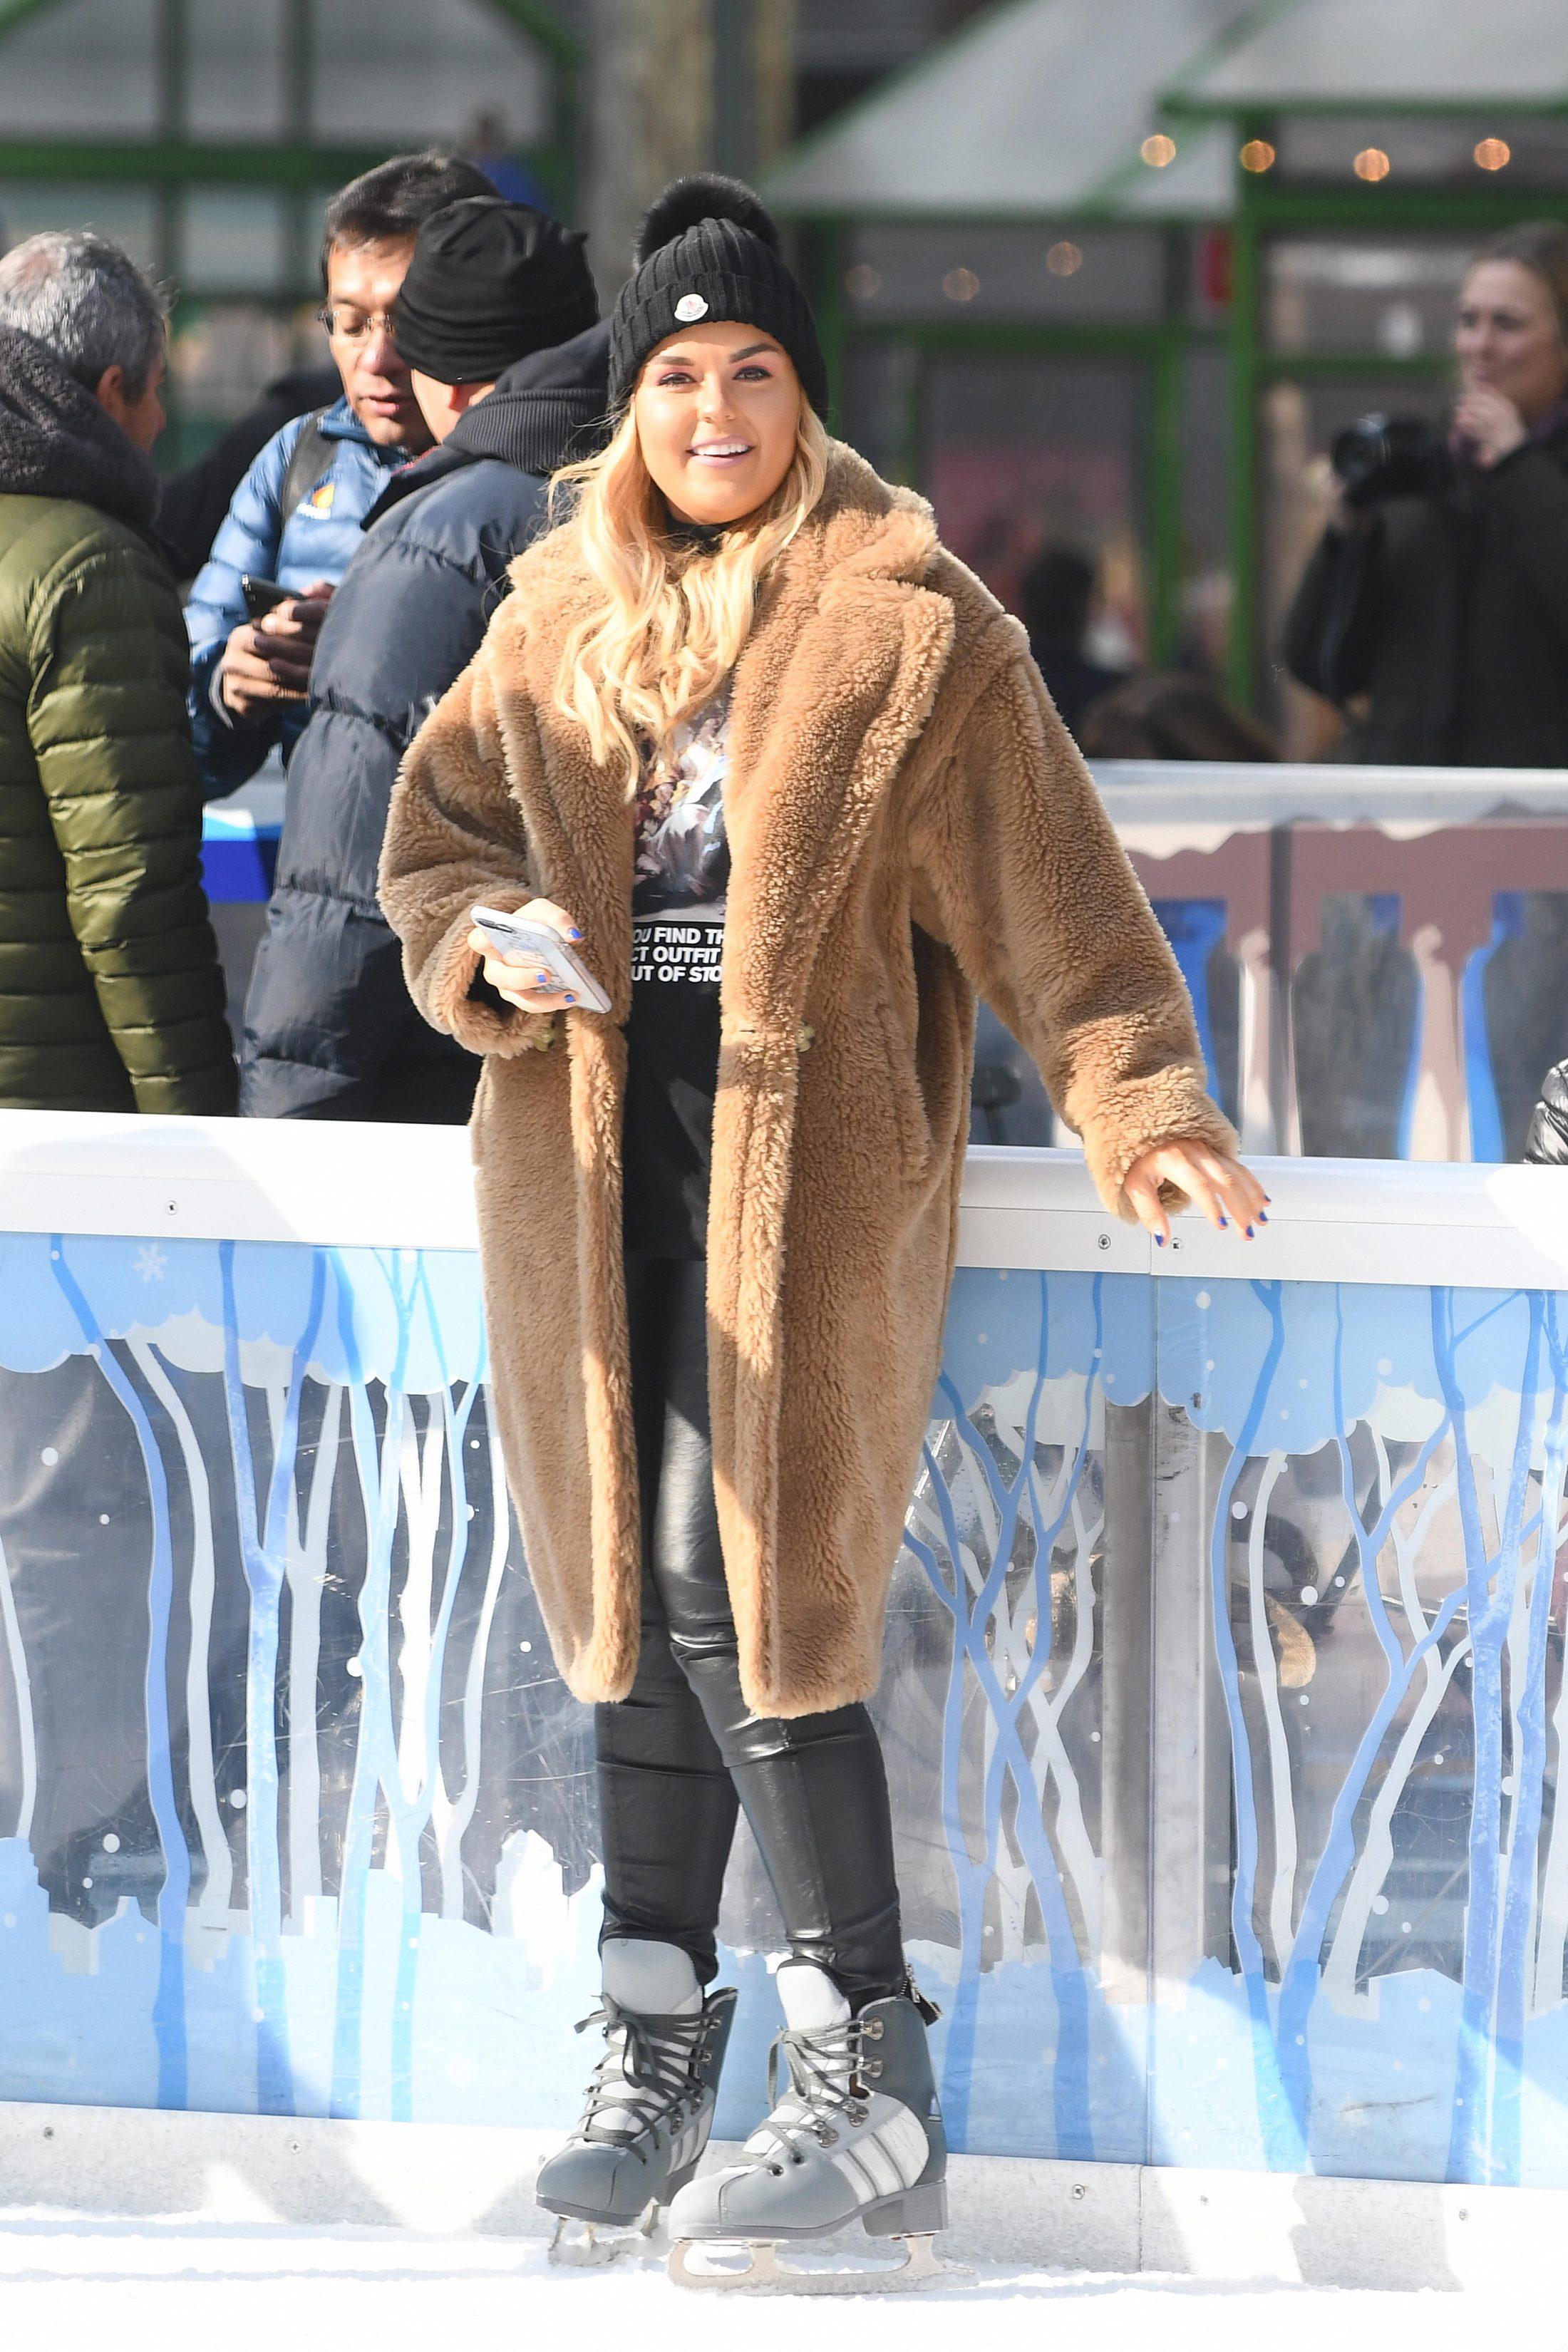 Tallia Storm 2018 : Tallia Storm: Ice skating in New York City -16